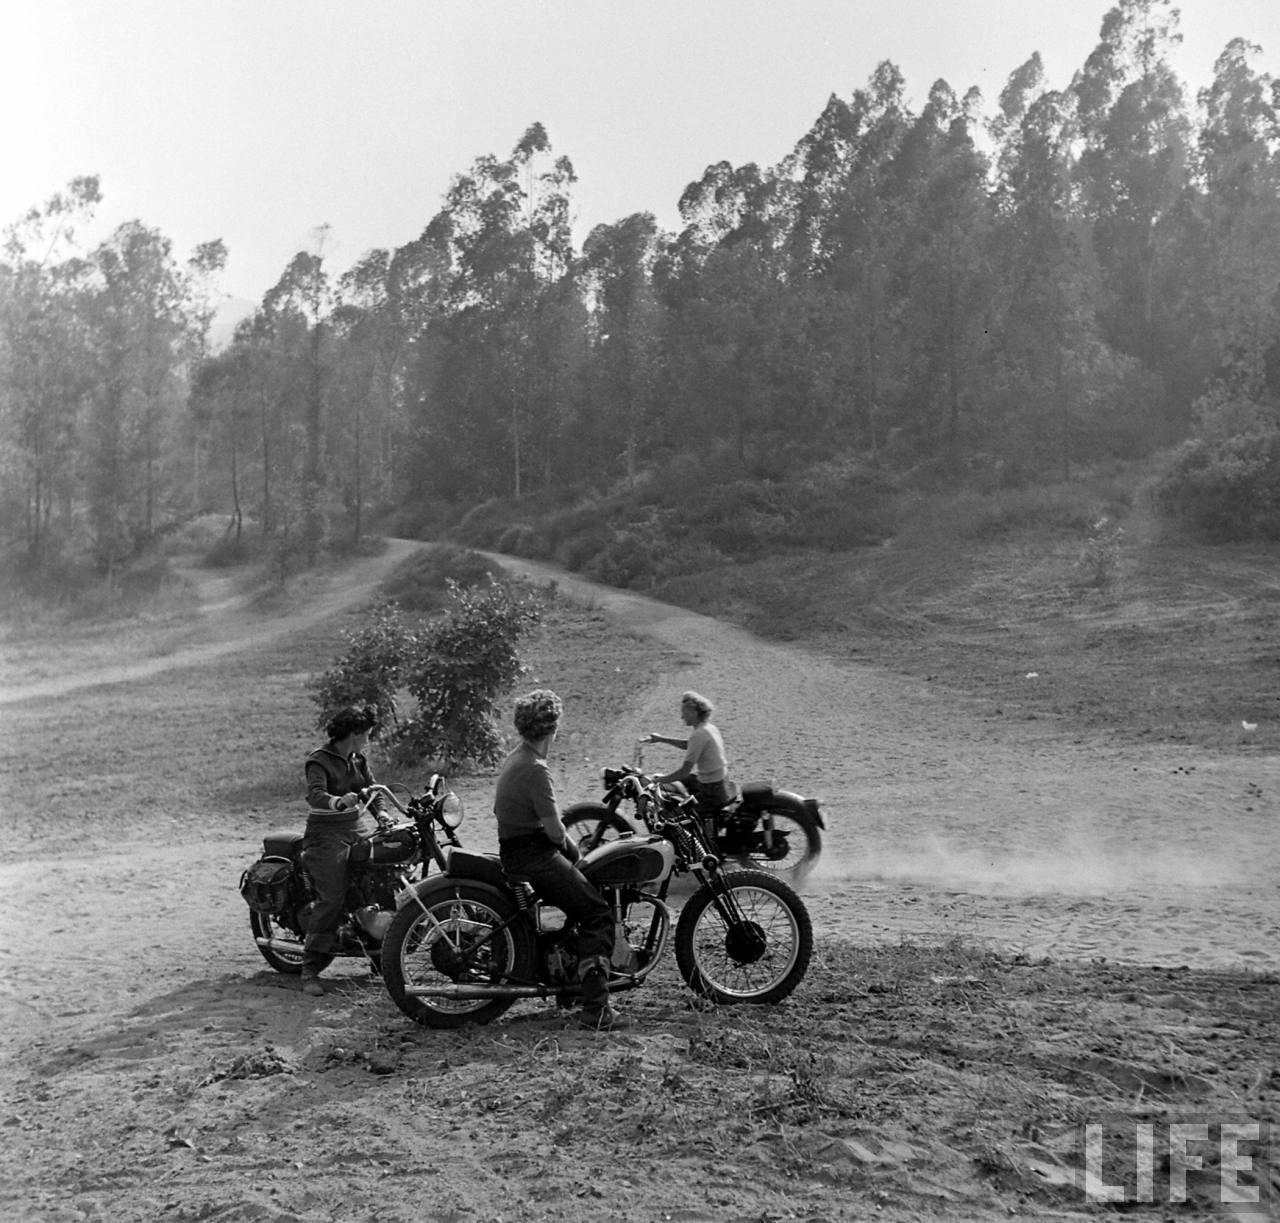 1940s Bike Girls: Fascinating Photos of Female